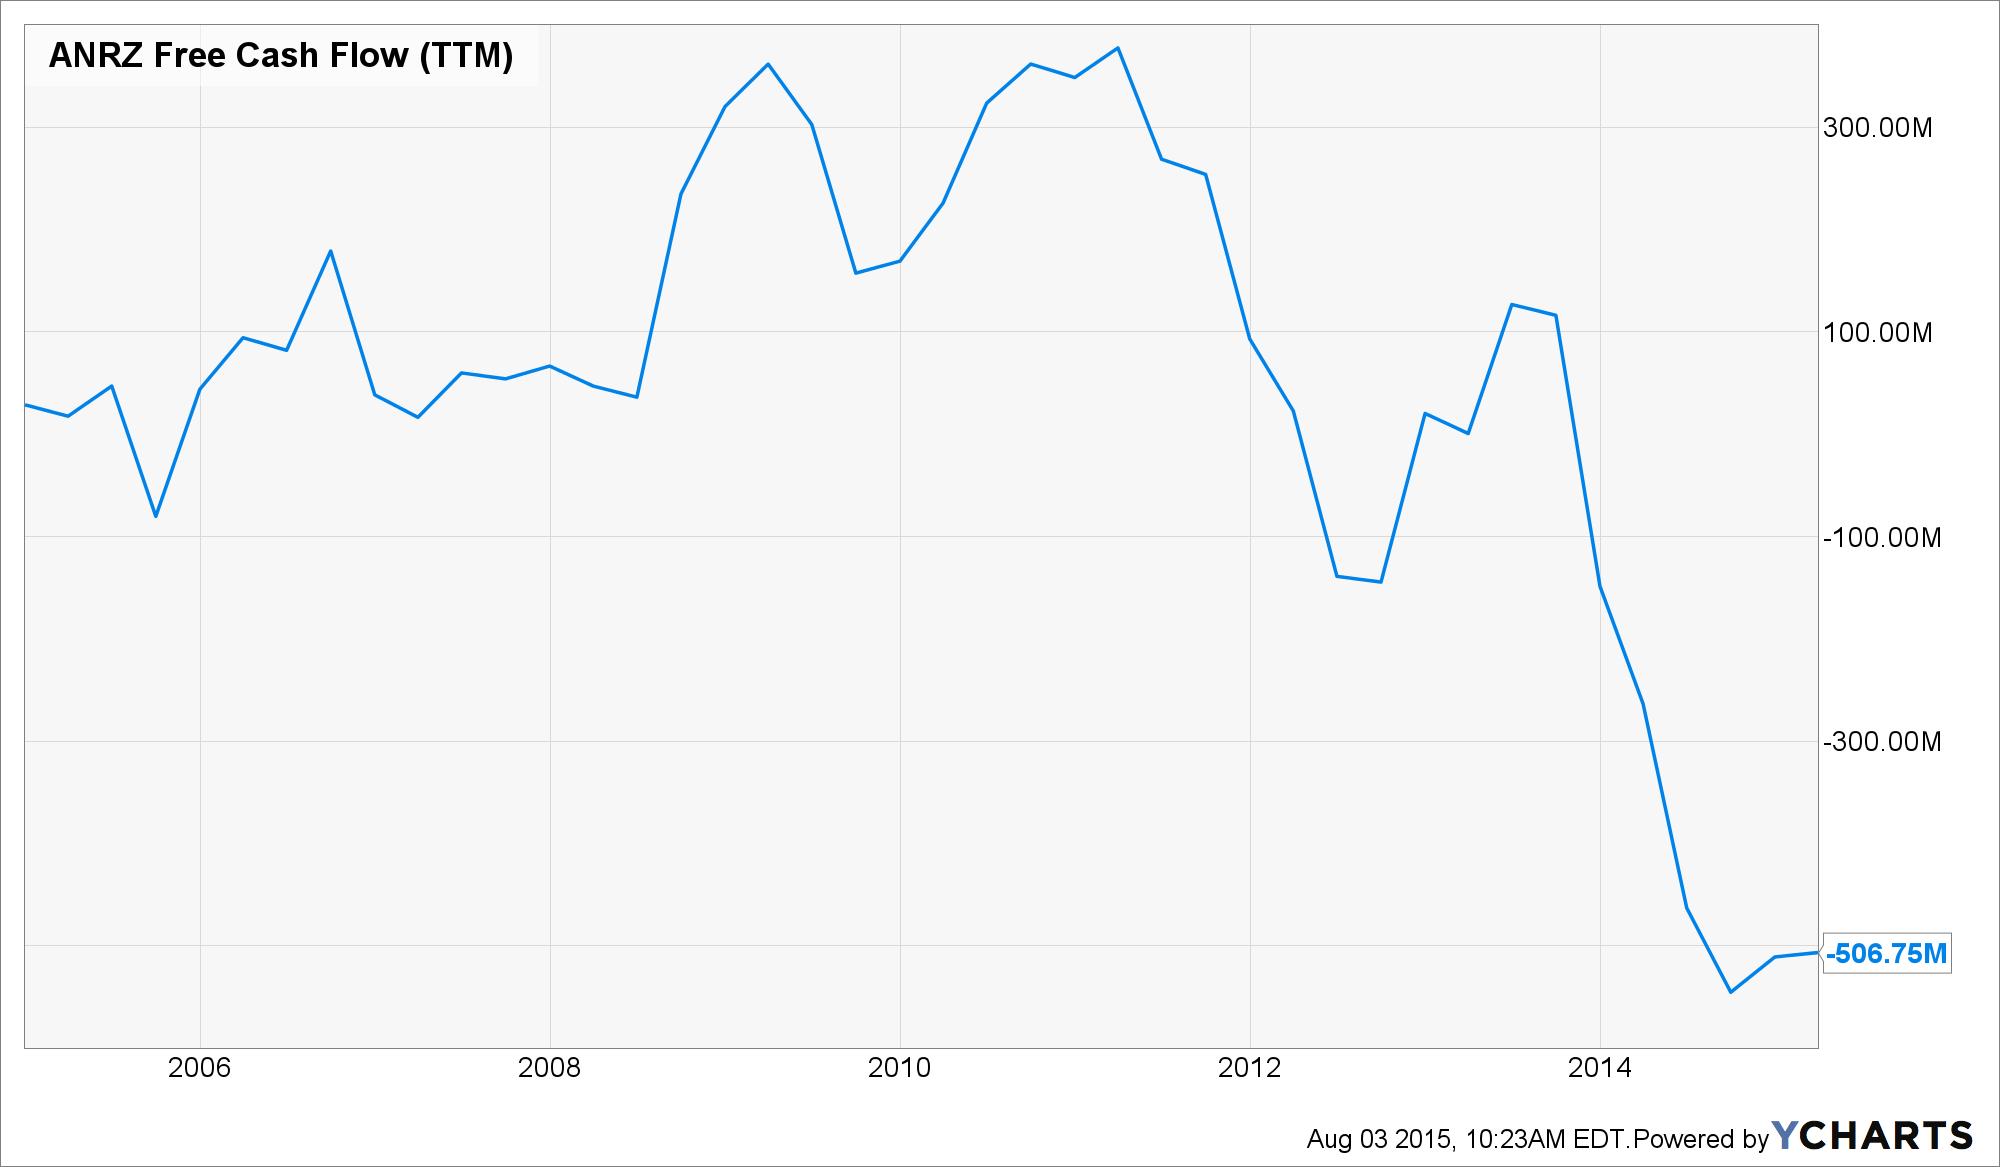 ANRZ Free Cash Flow (TTM) Chart